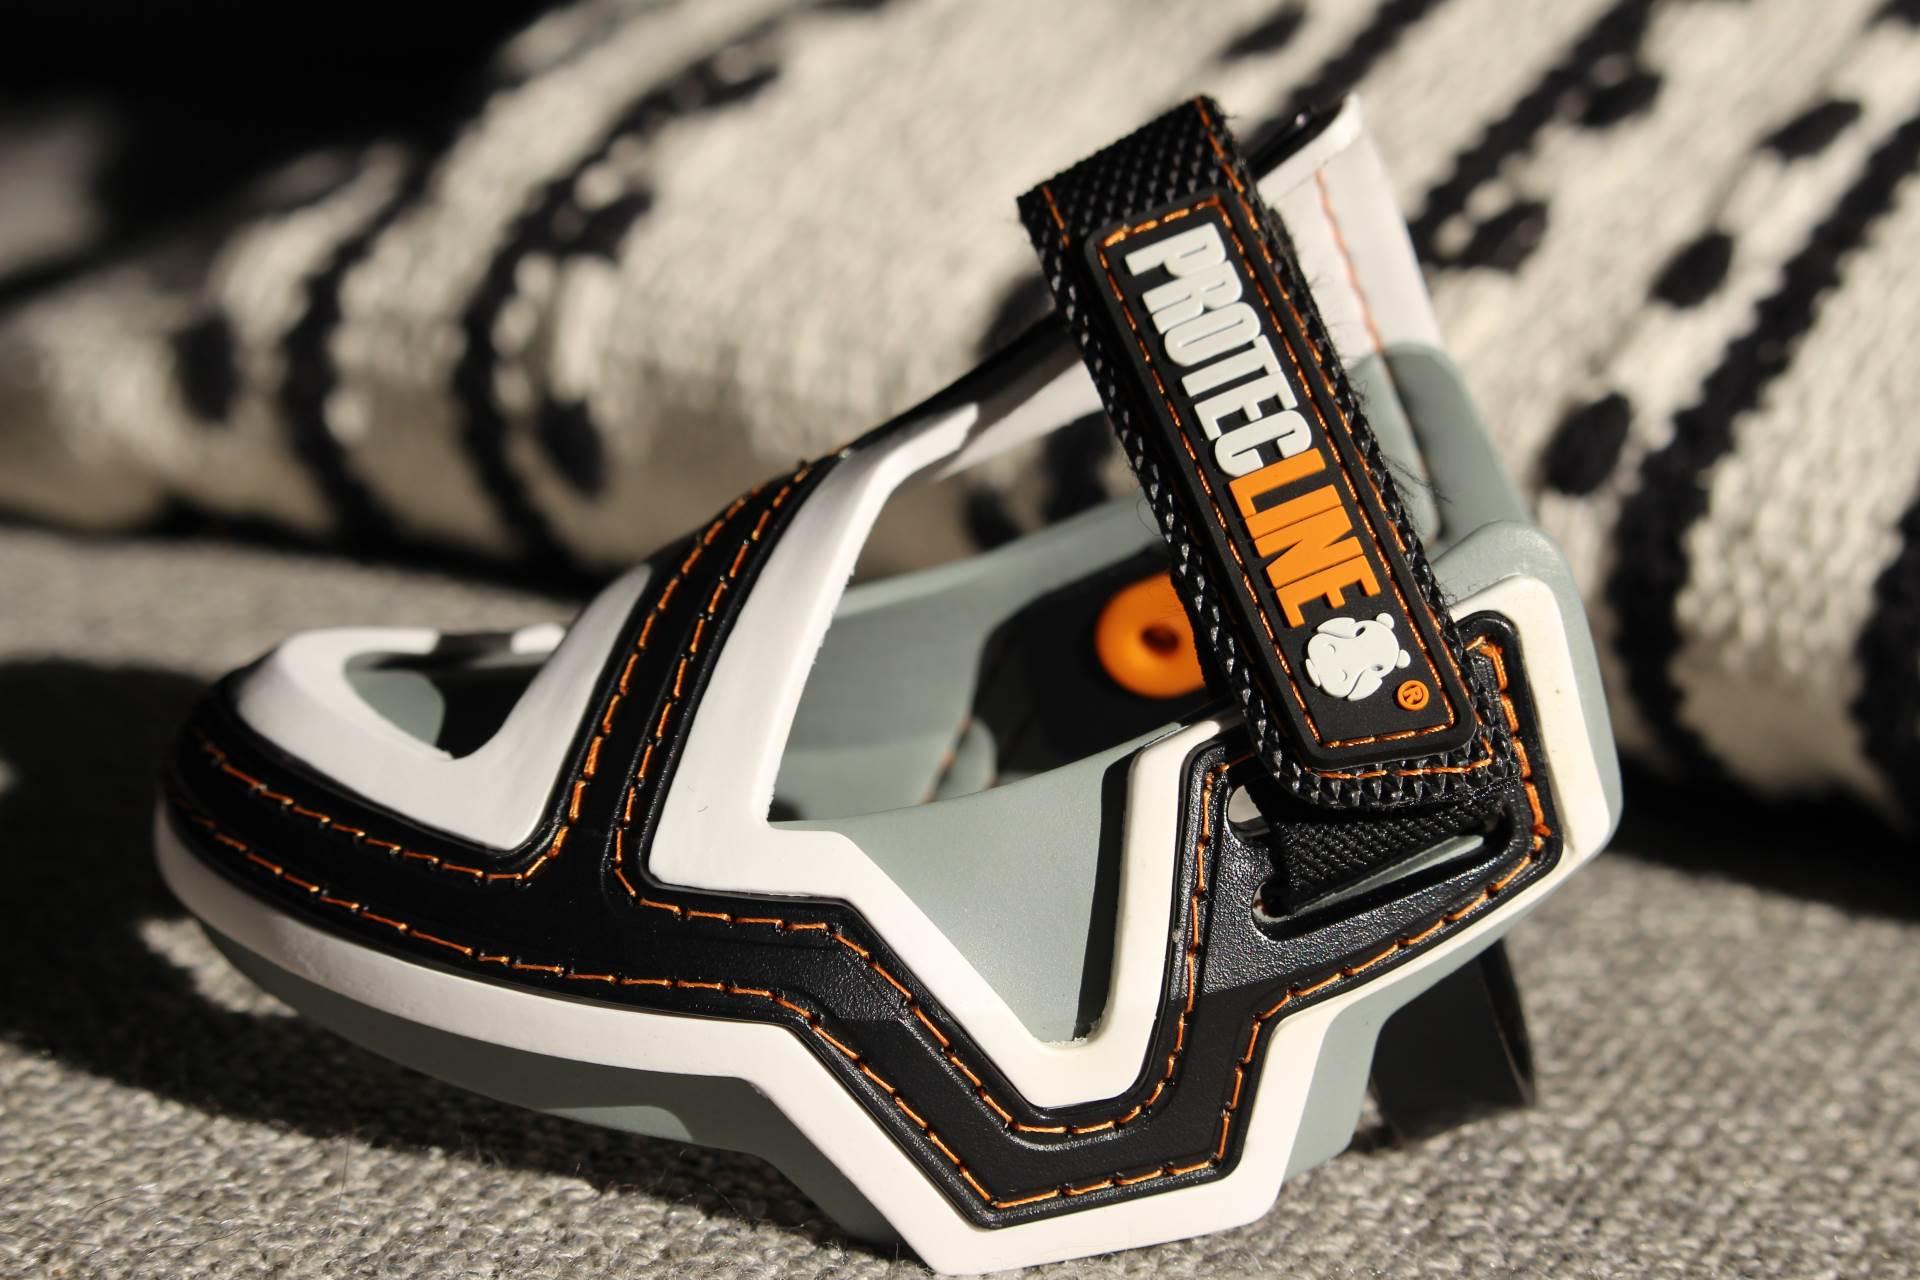 Protec-Line Foot Protector